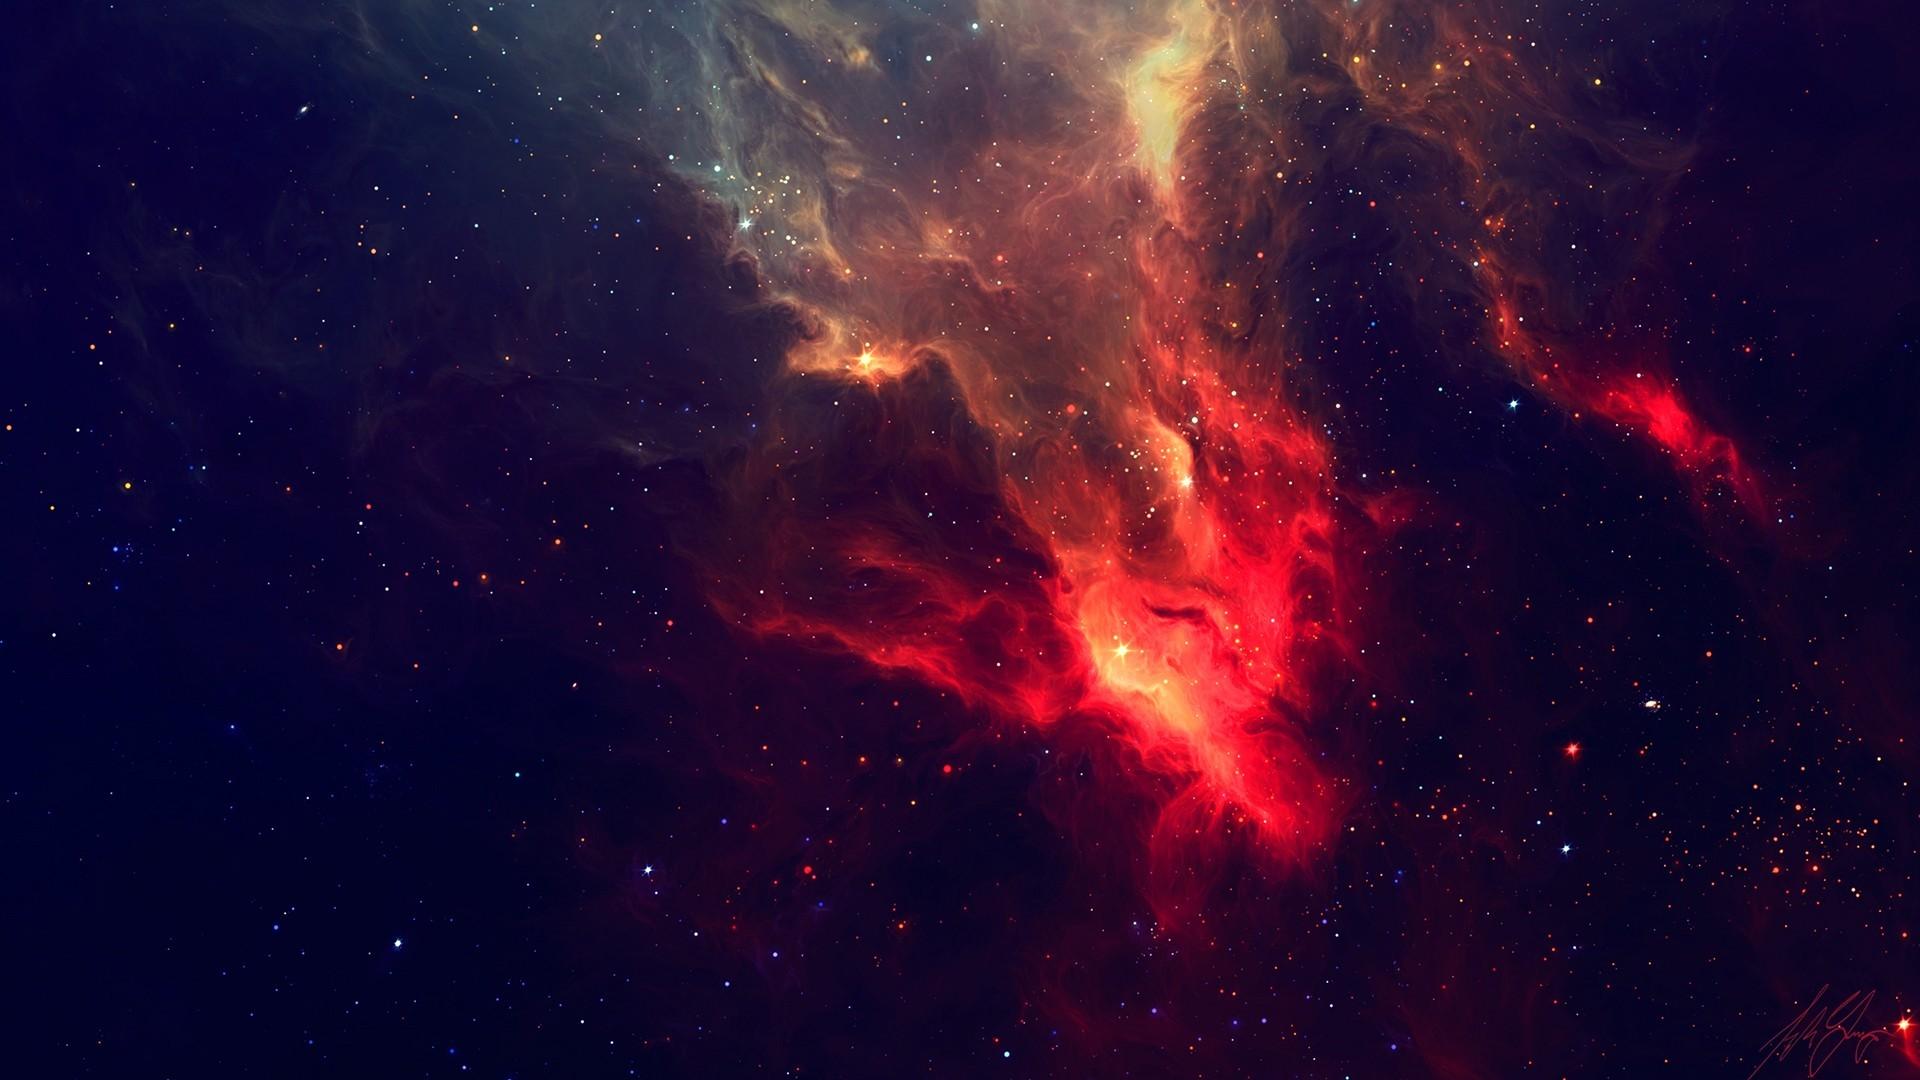 Galaxy+Tumblr   Andromeda Galaxy Tumblr Resolution Wallpaper Pictures